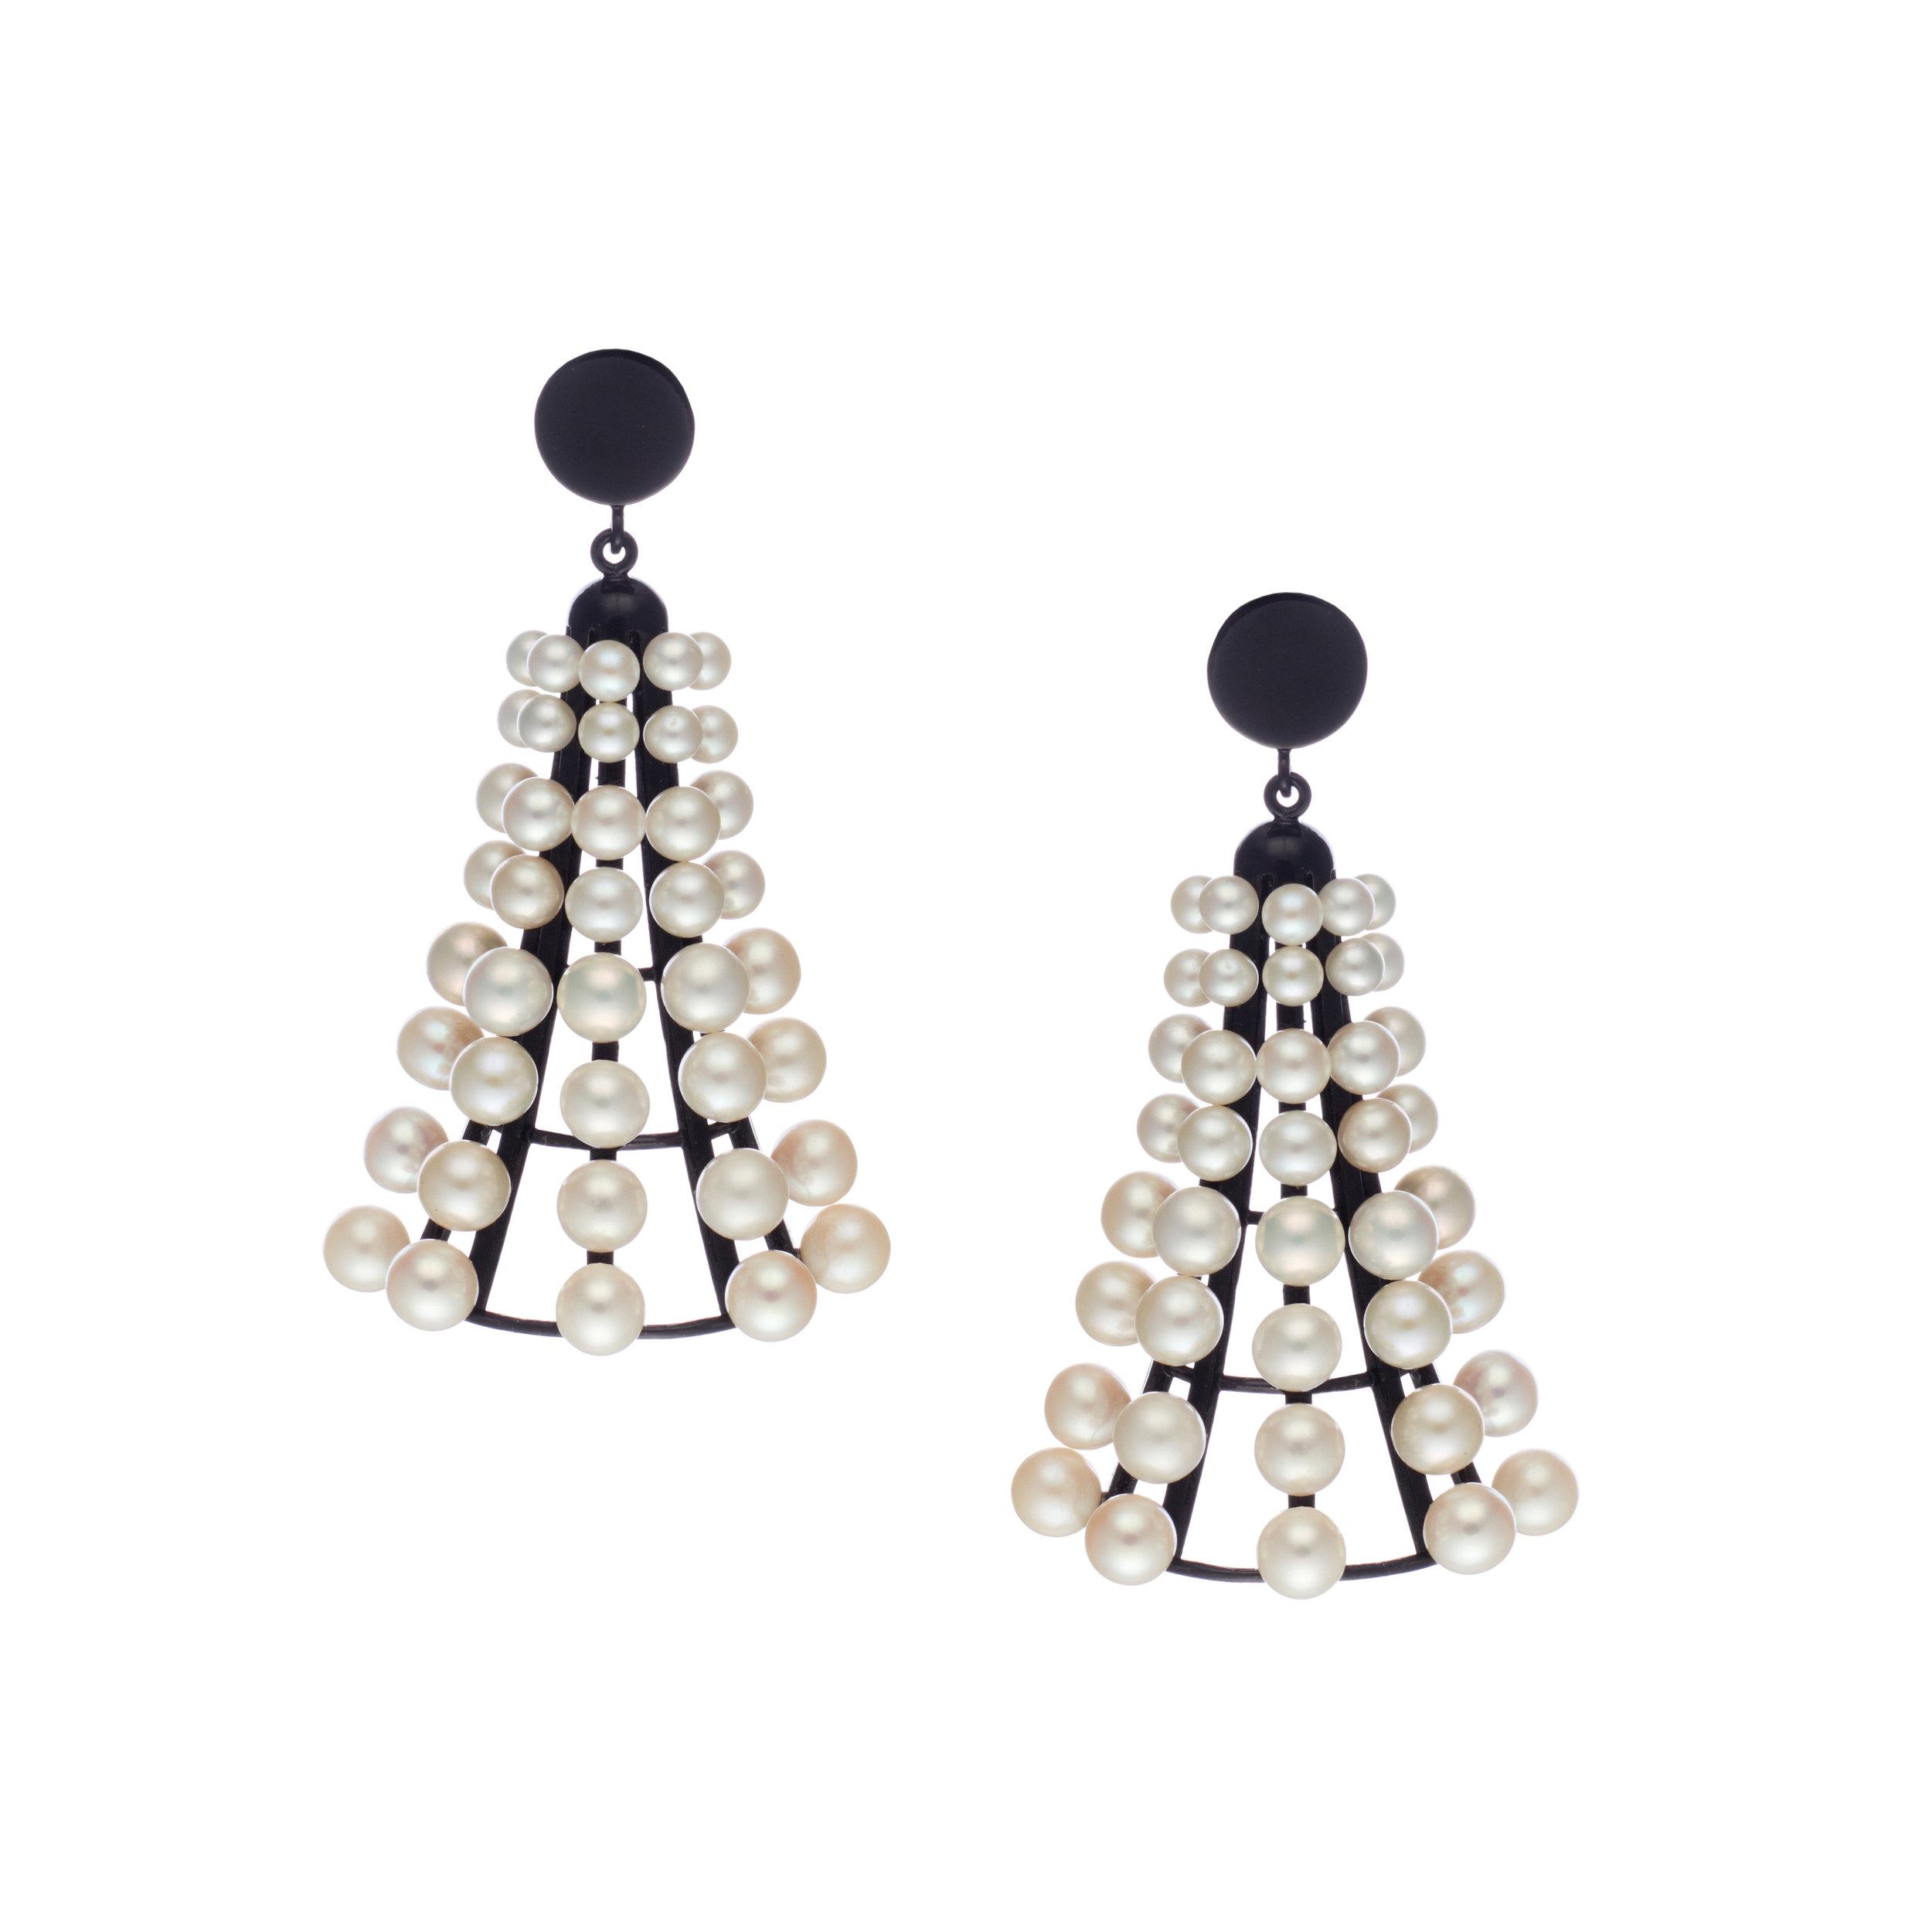 Carillon I - Earrings